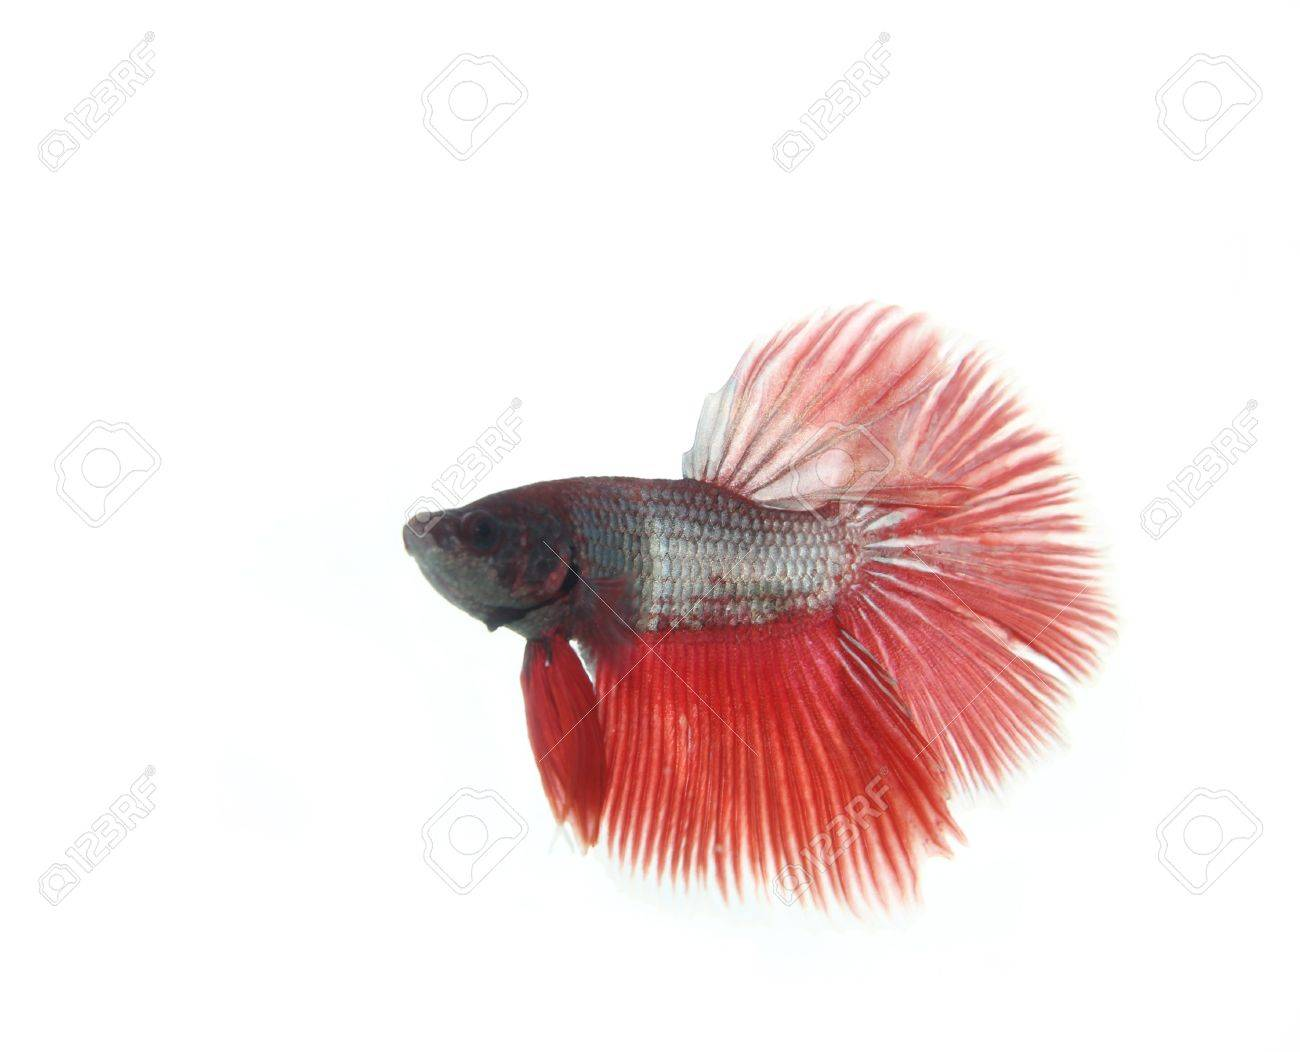 Red betta fish on white background Stock Photo - 13414166